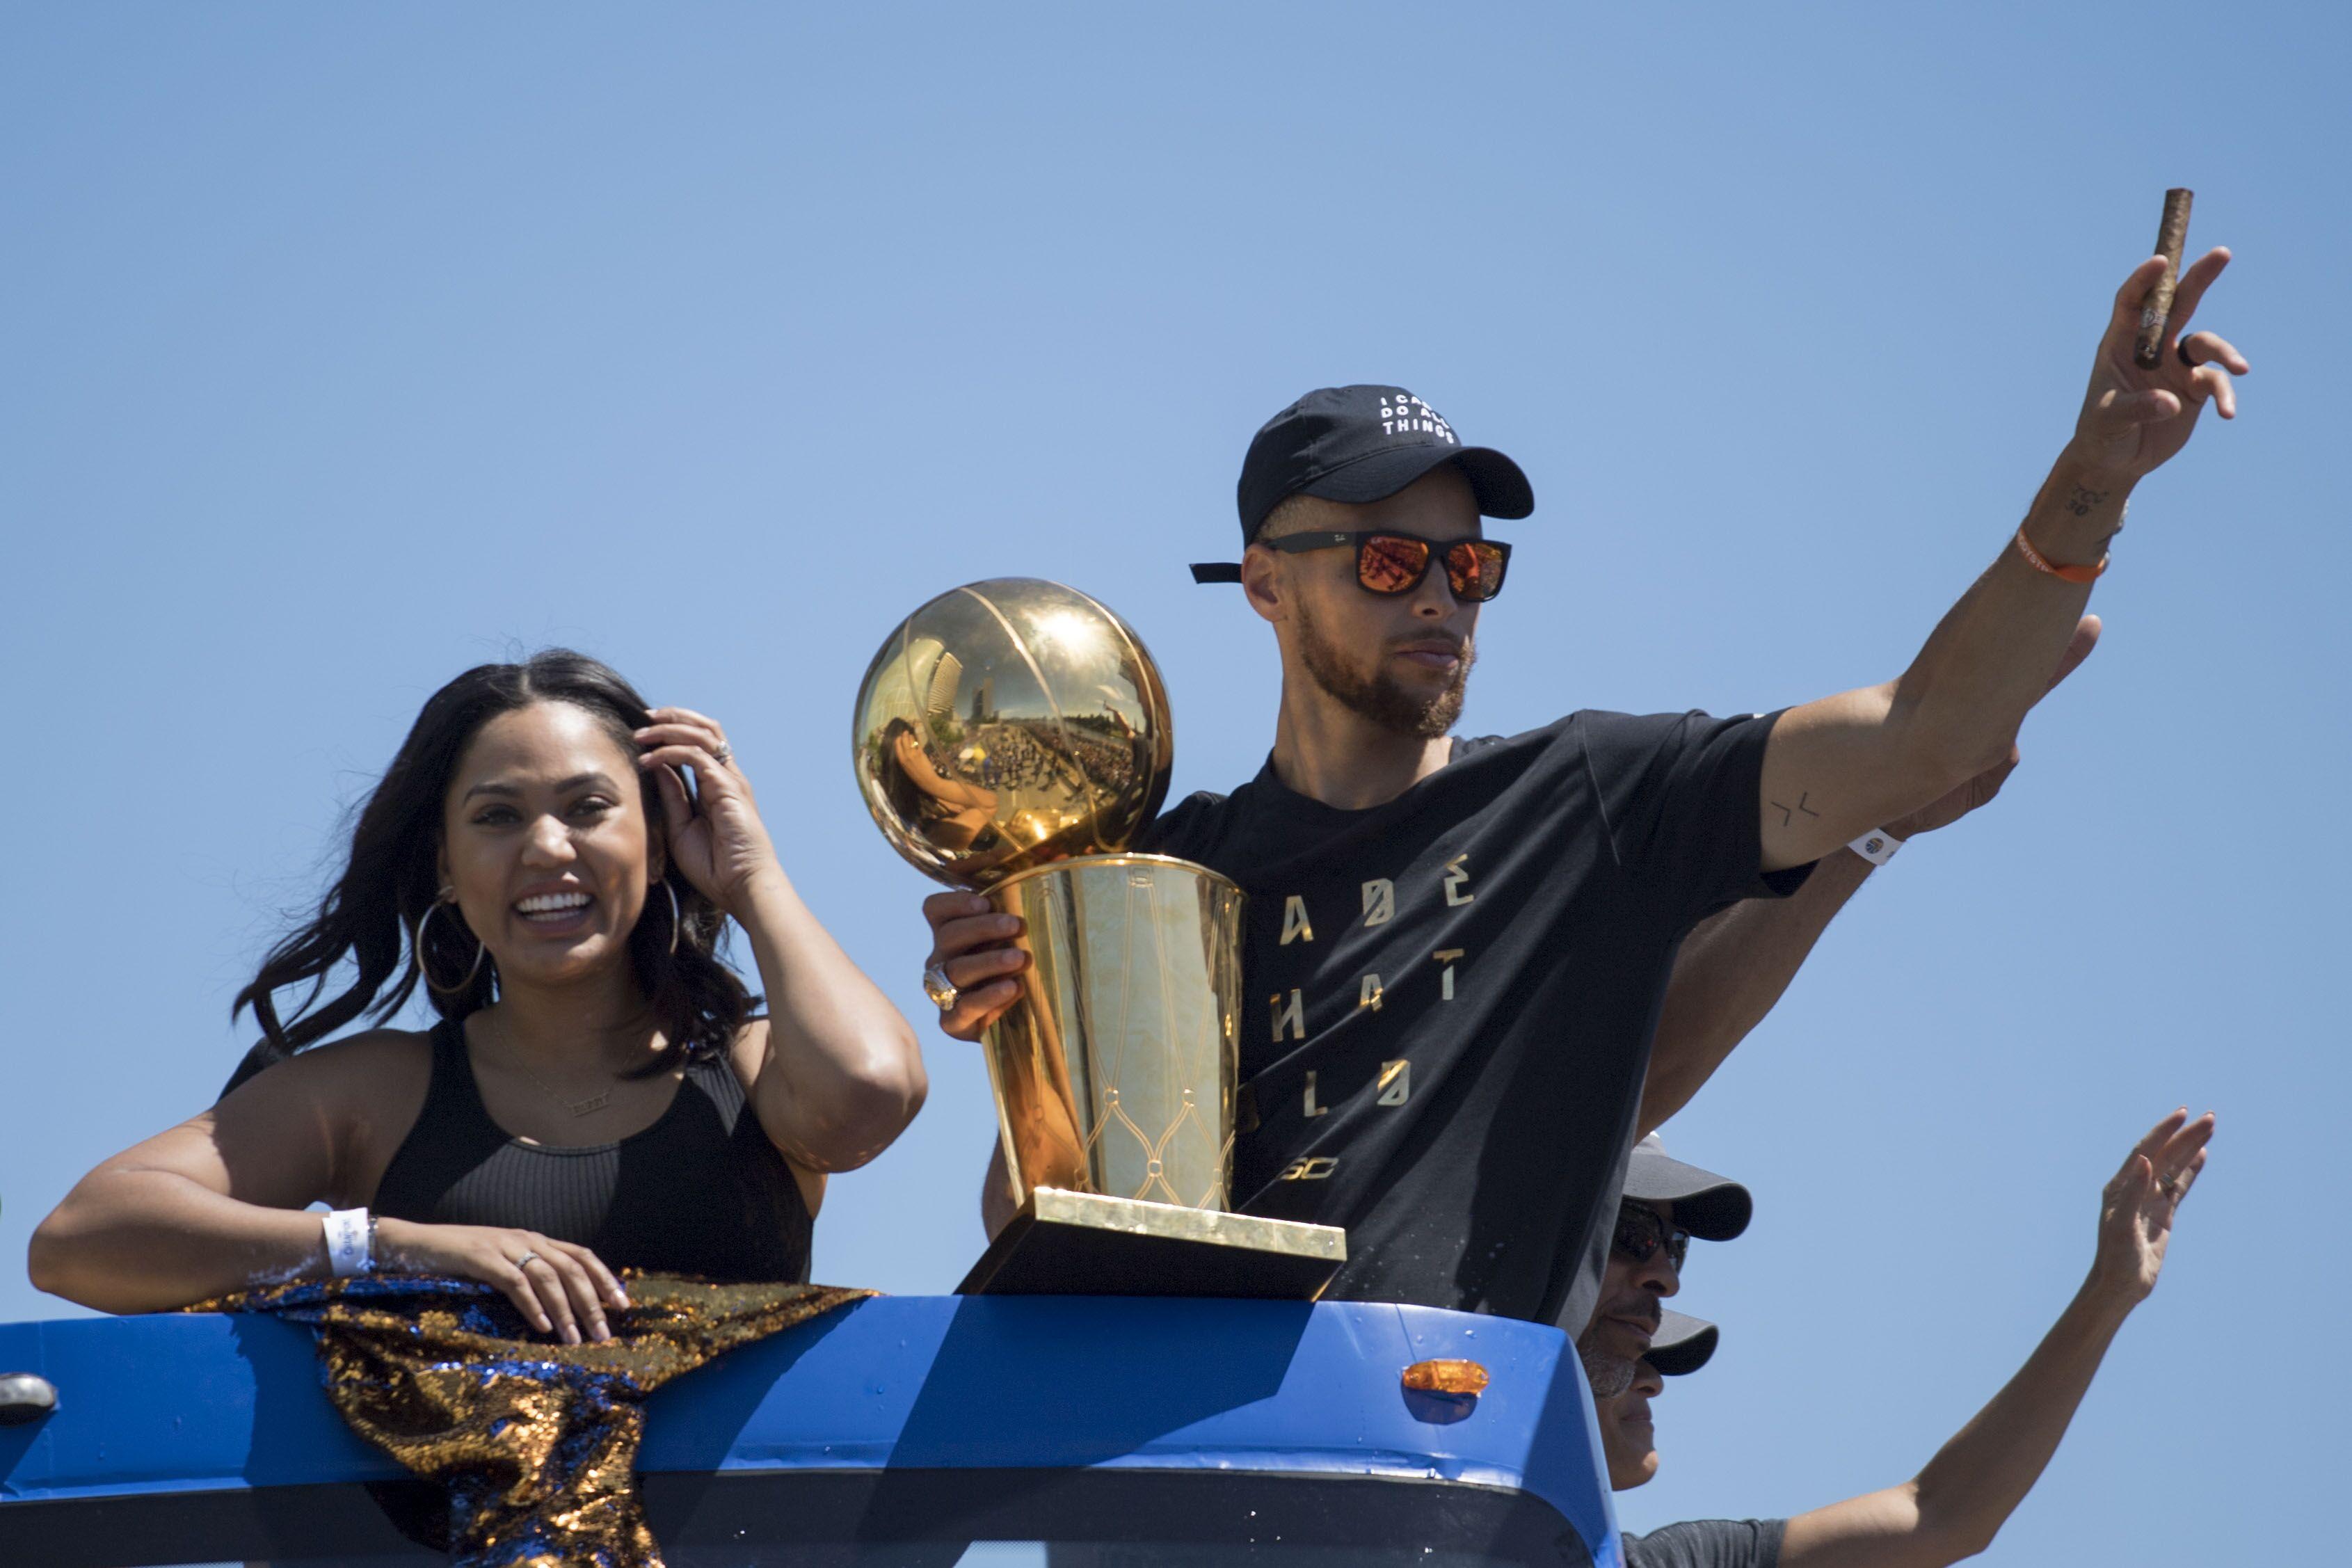 Golden State Warriors Top 10 NBA Draft picks in franchise history